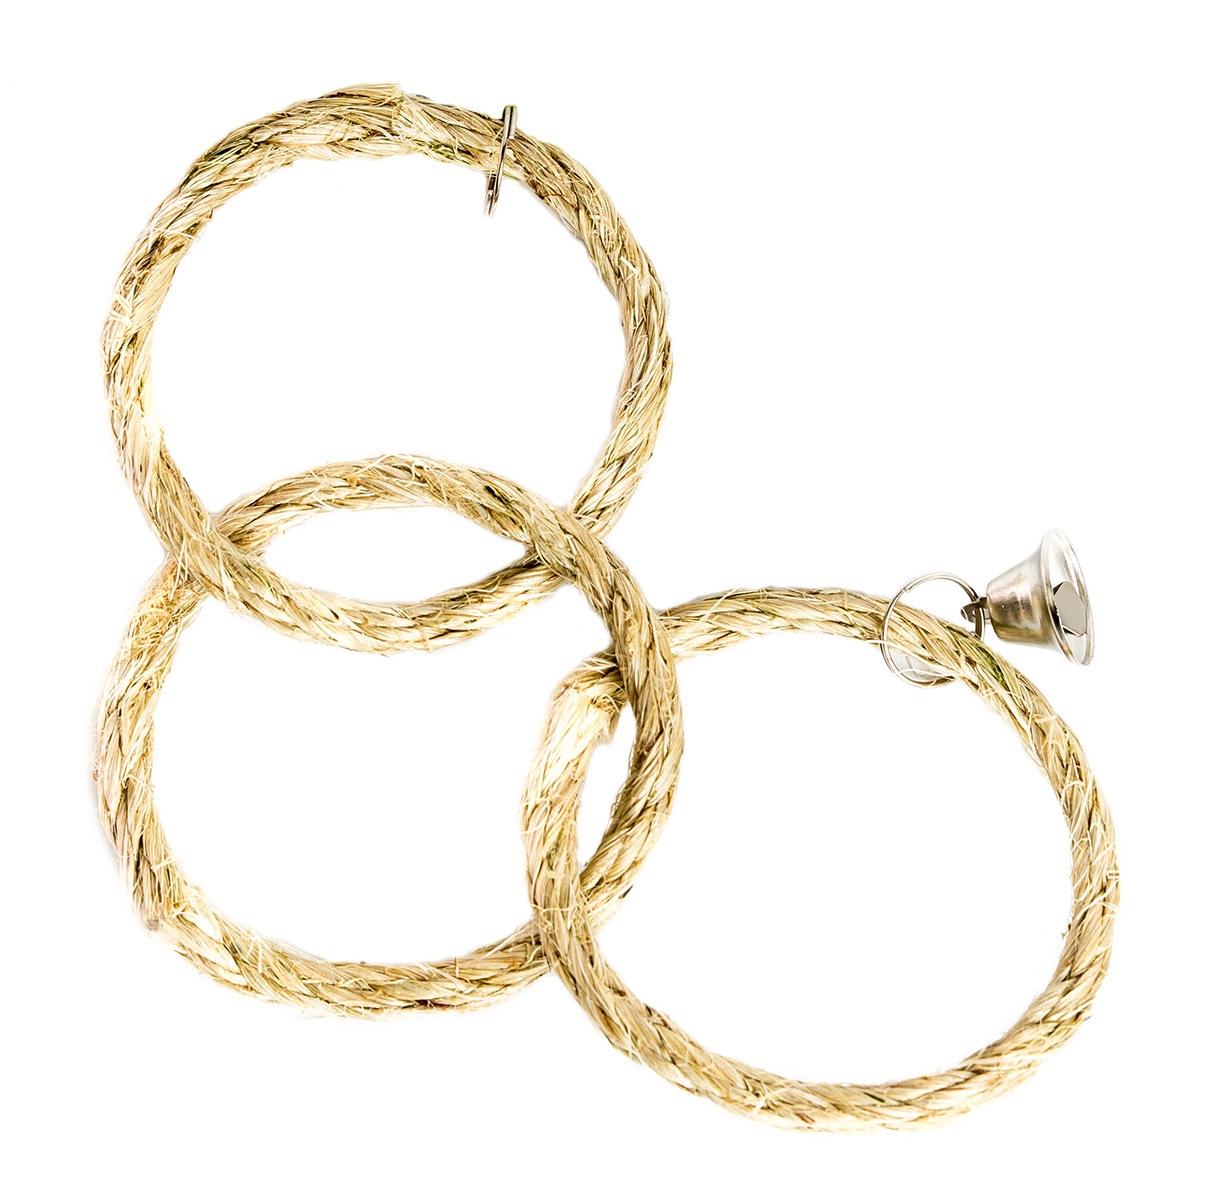 Игрушка для птиц Три сизалевых кольца zoobaloo игрушка для птиц кольцо сизаль с колокольчиком 15см